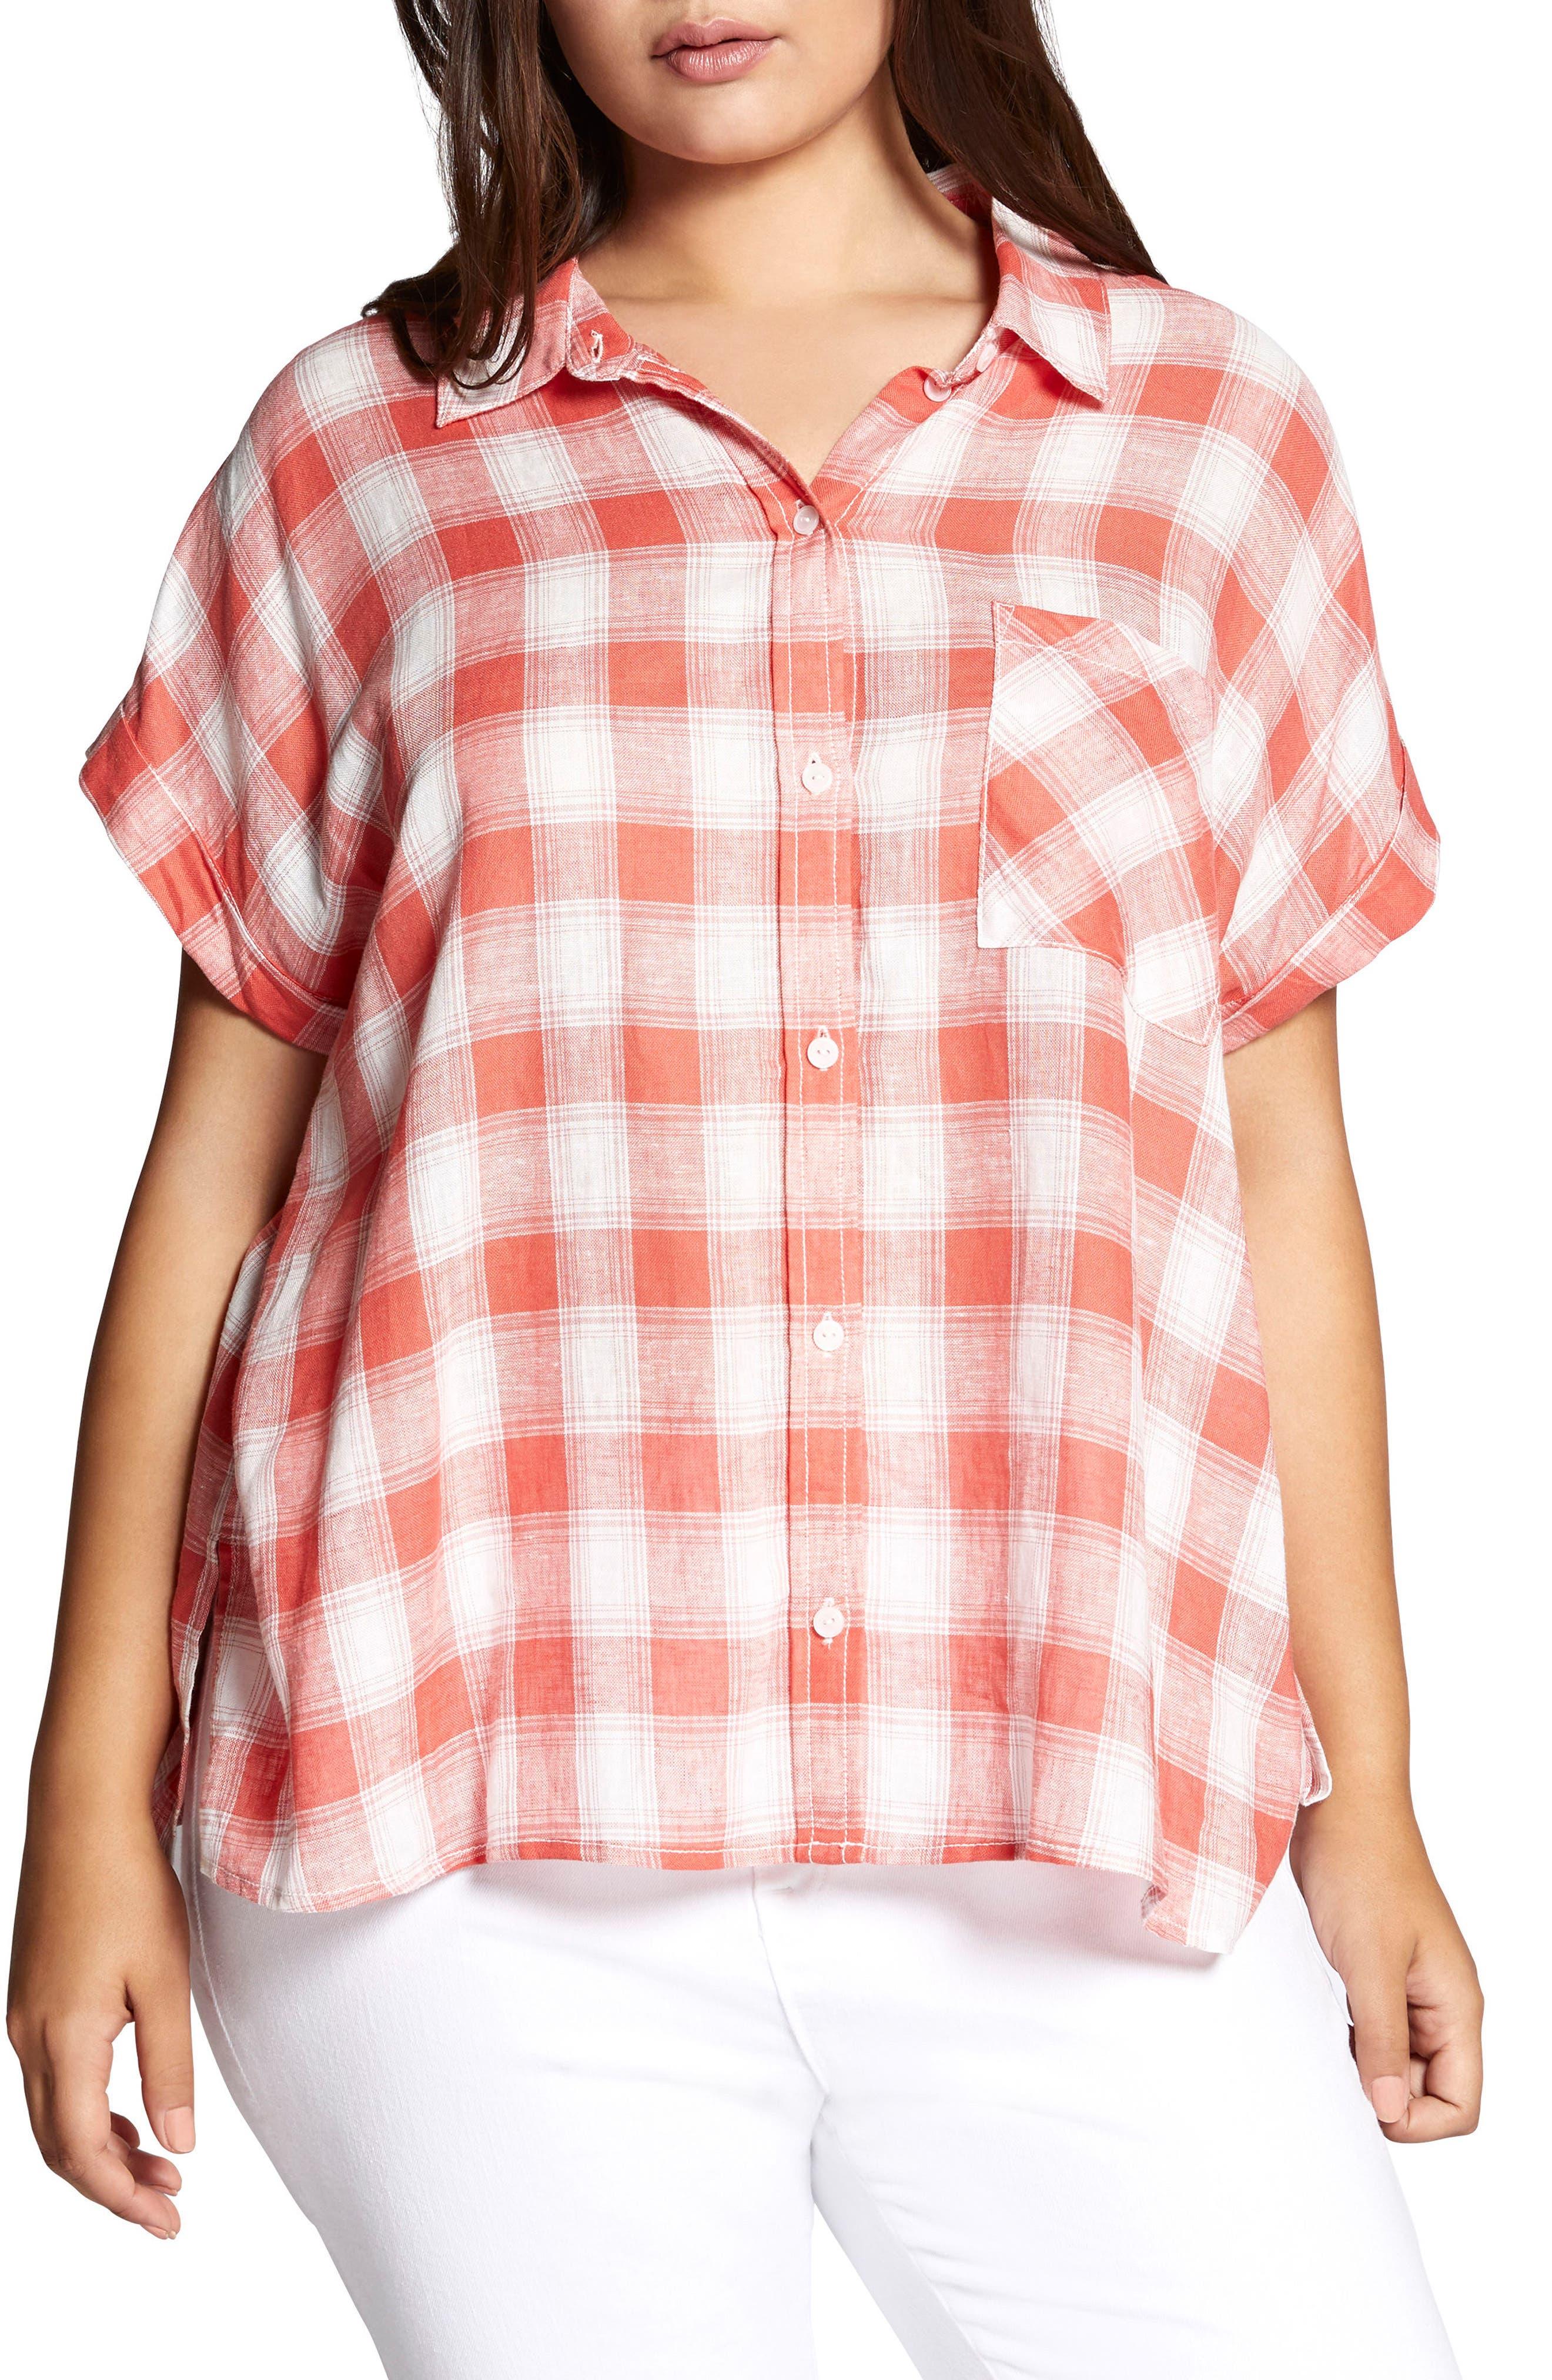 Mod Check Boyfriend Shirt,                         Main,                         color, CHILI PLAID